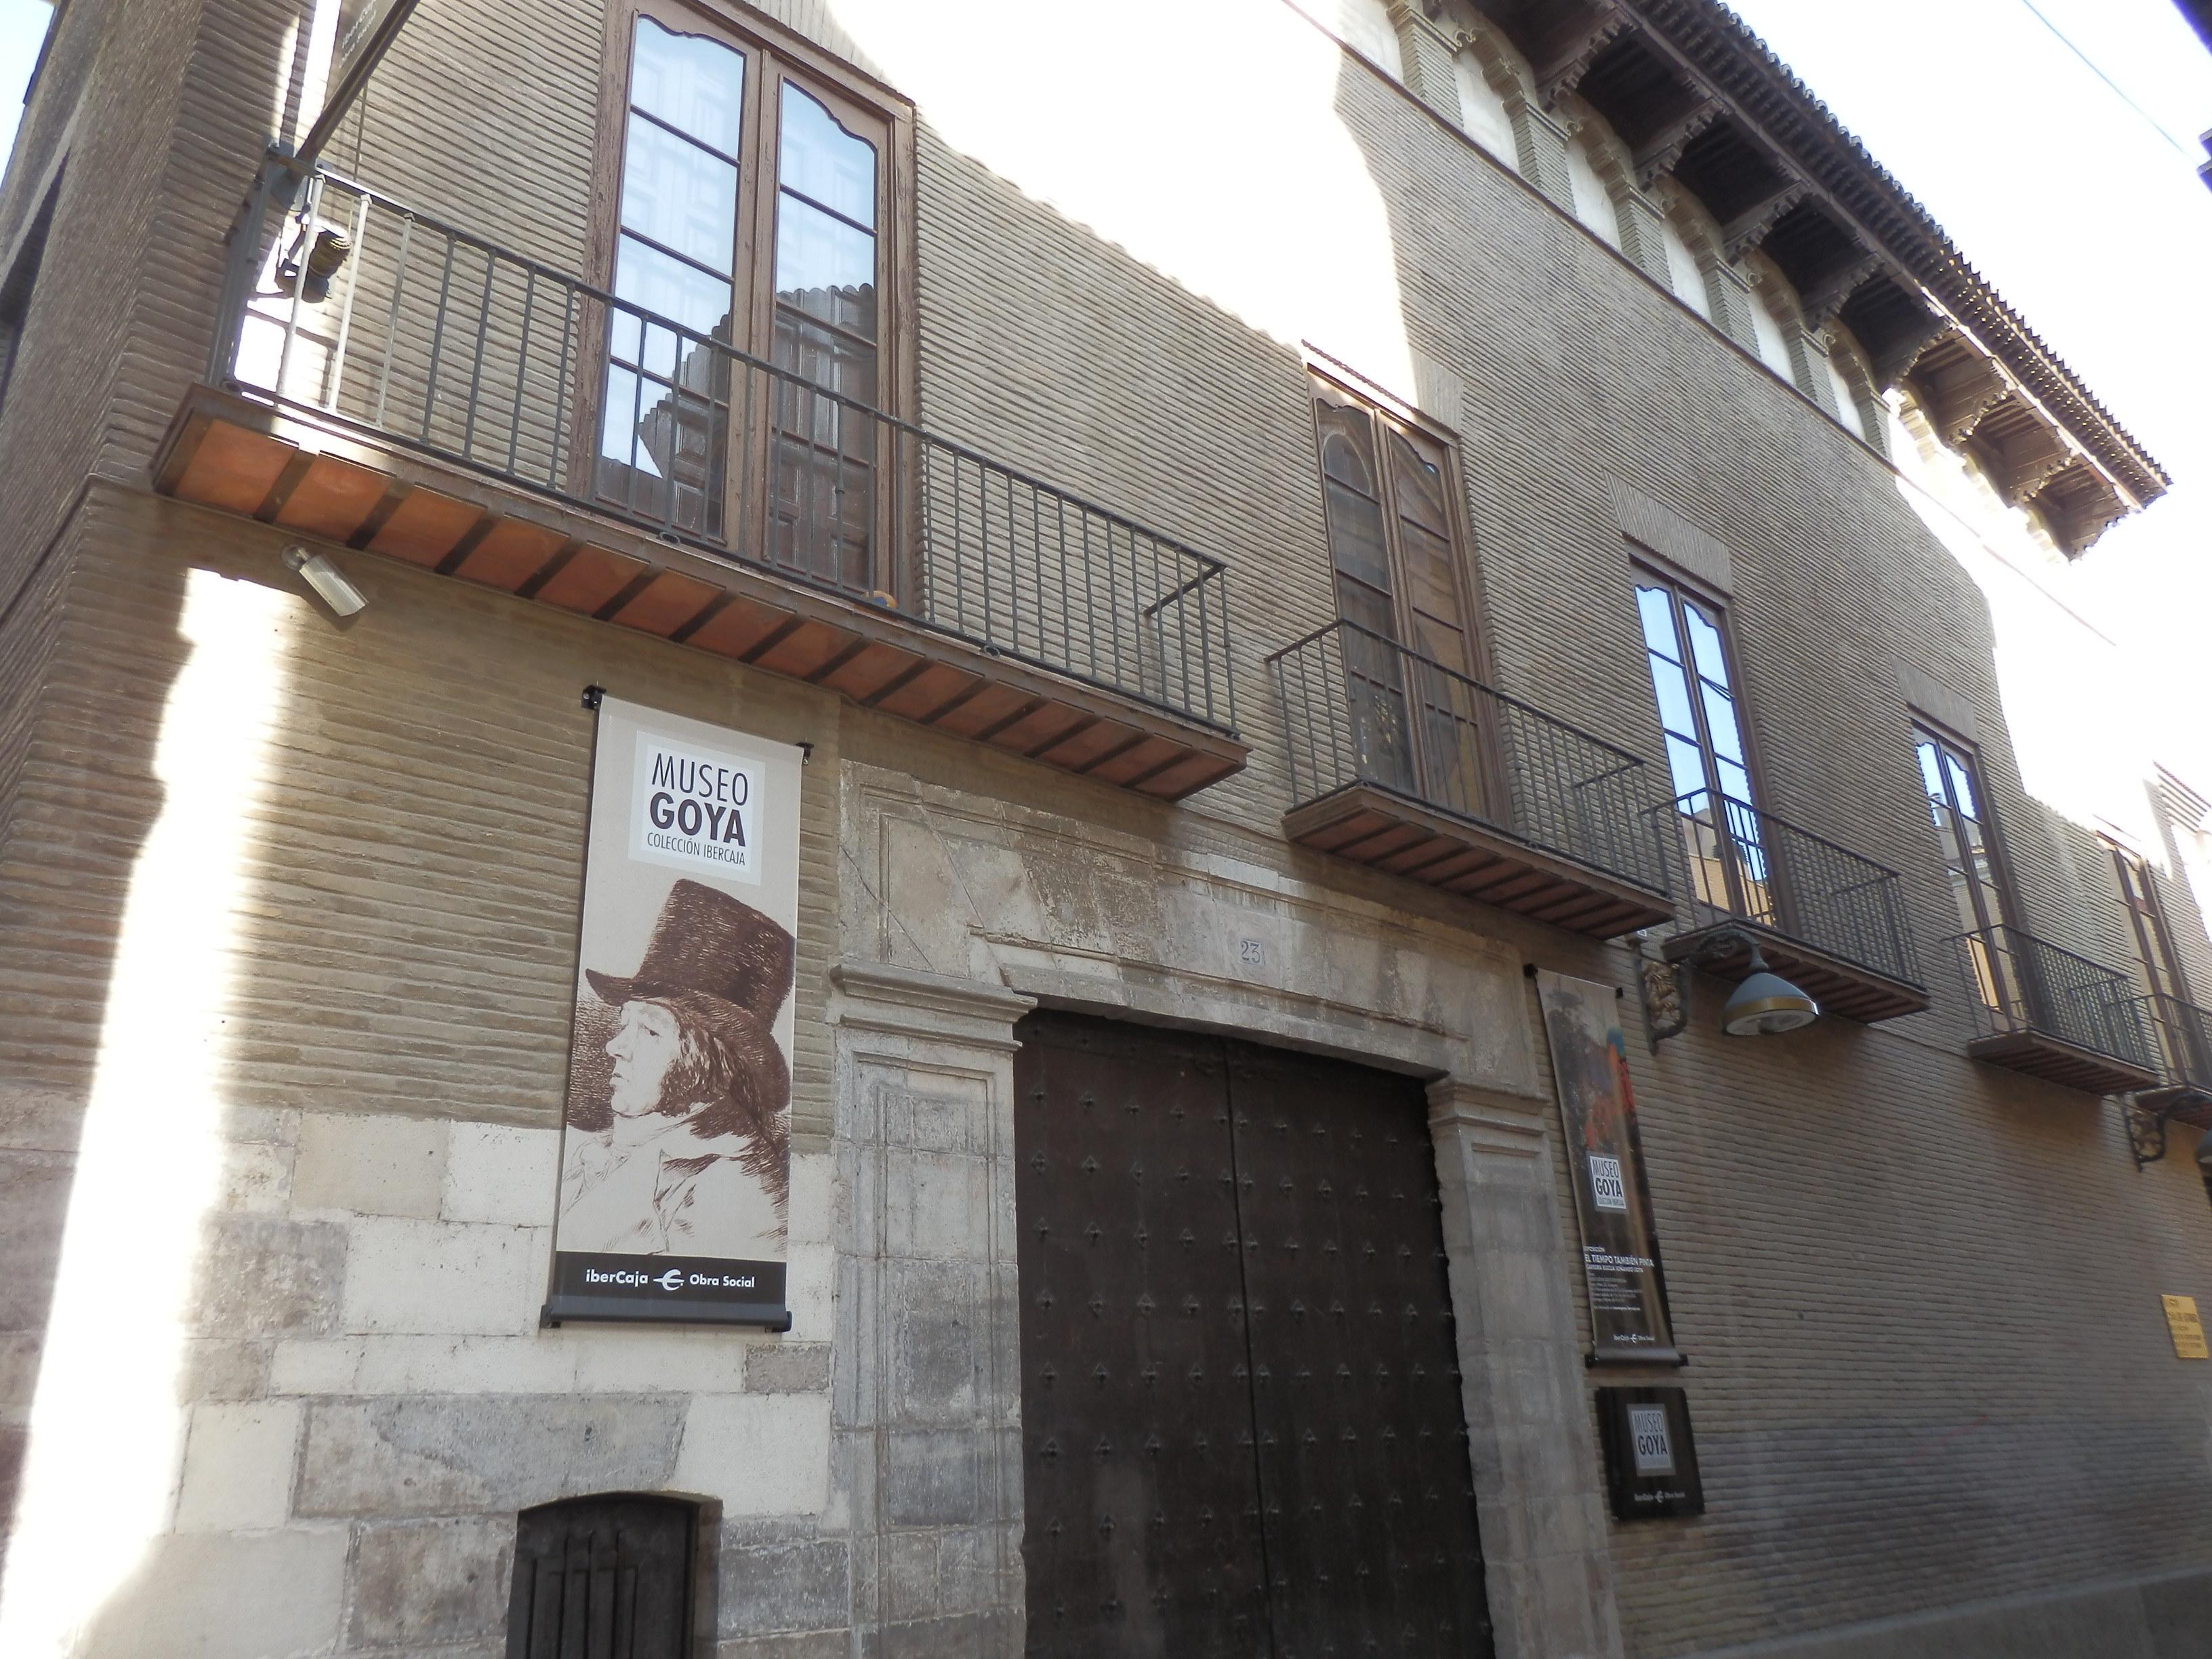 File:Museo Goya Zaragoza 2.jpg - Wikimedia Commons